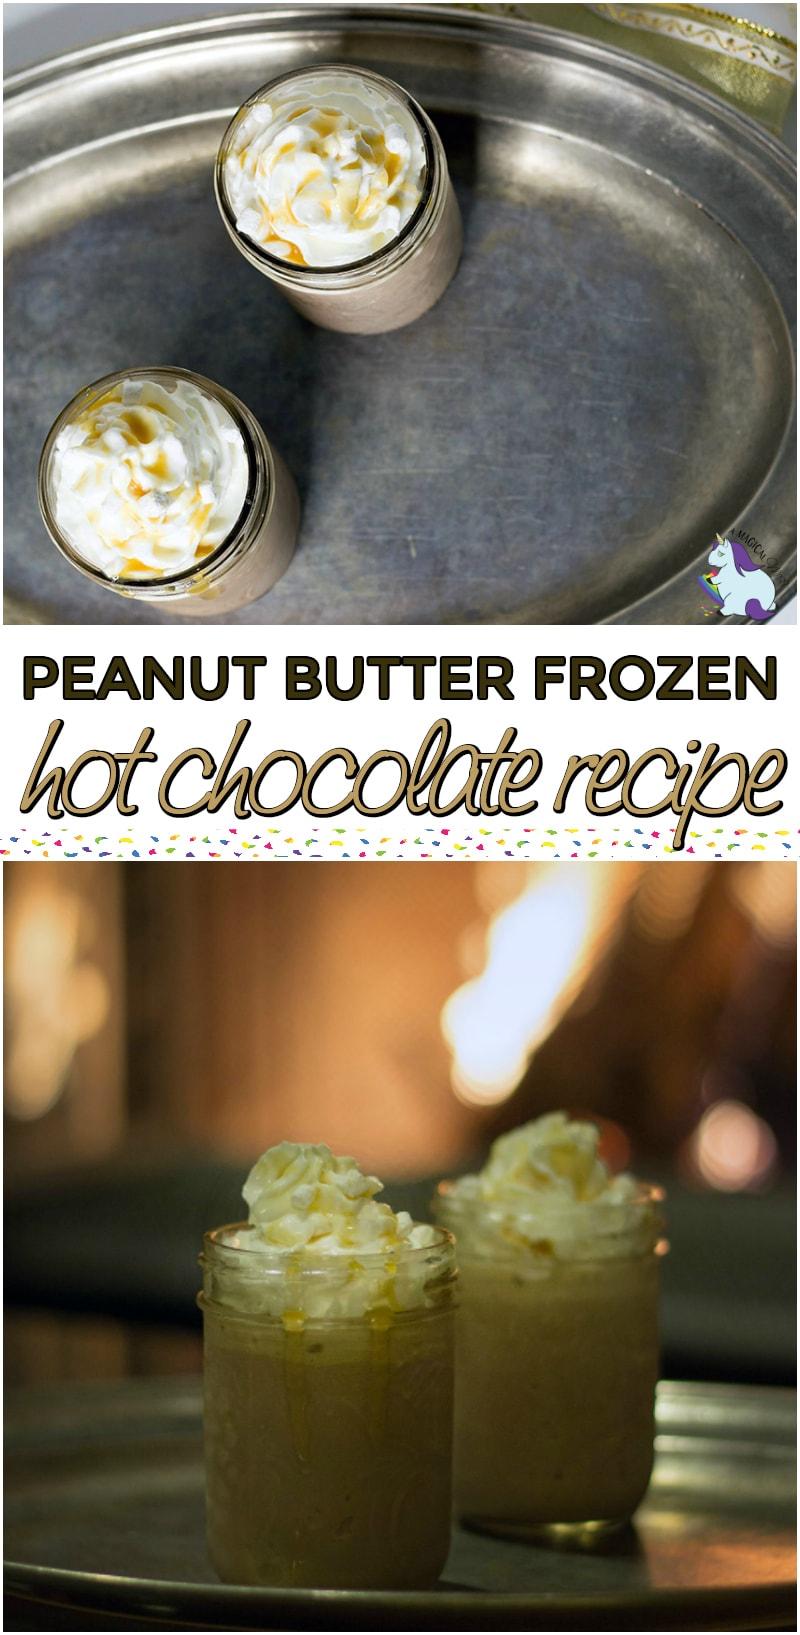 Peanut Butter Frozen Hot Chocolate Recipe